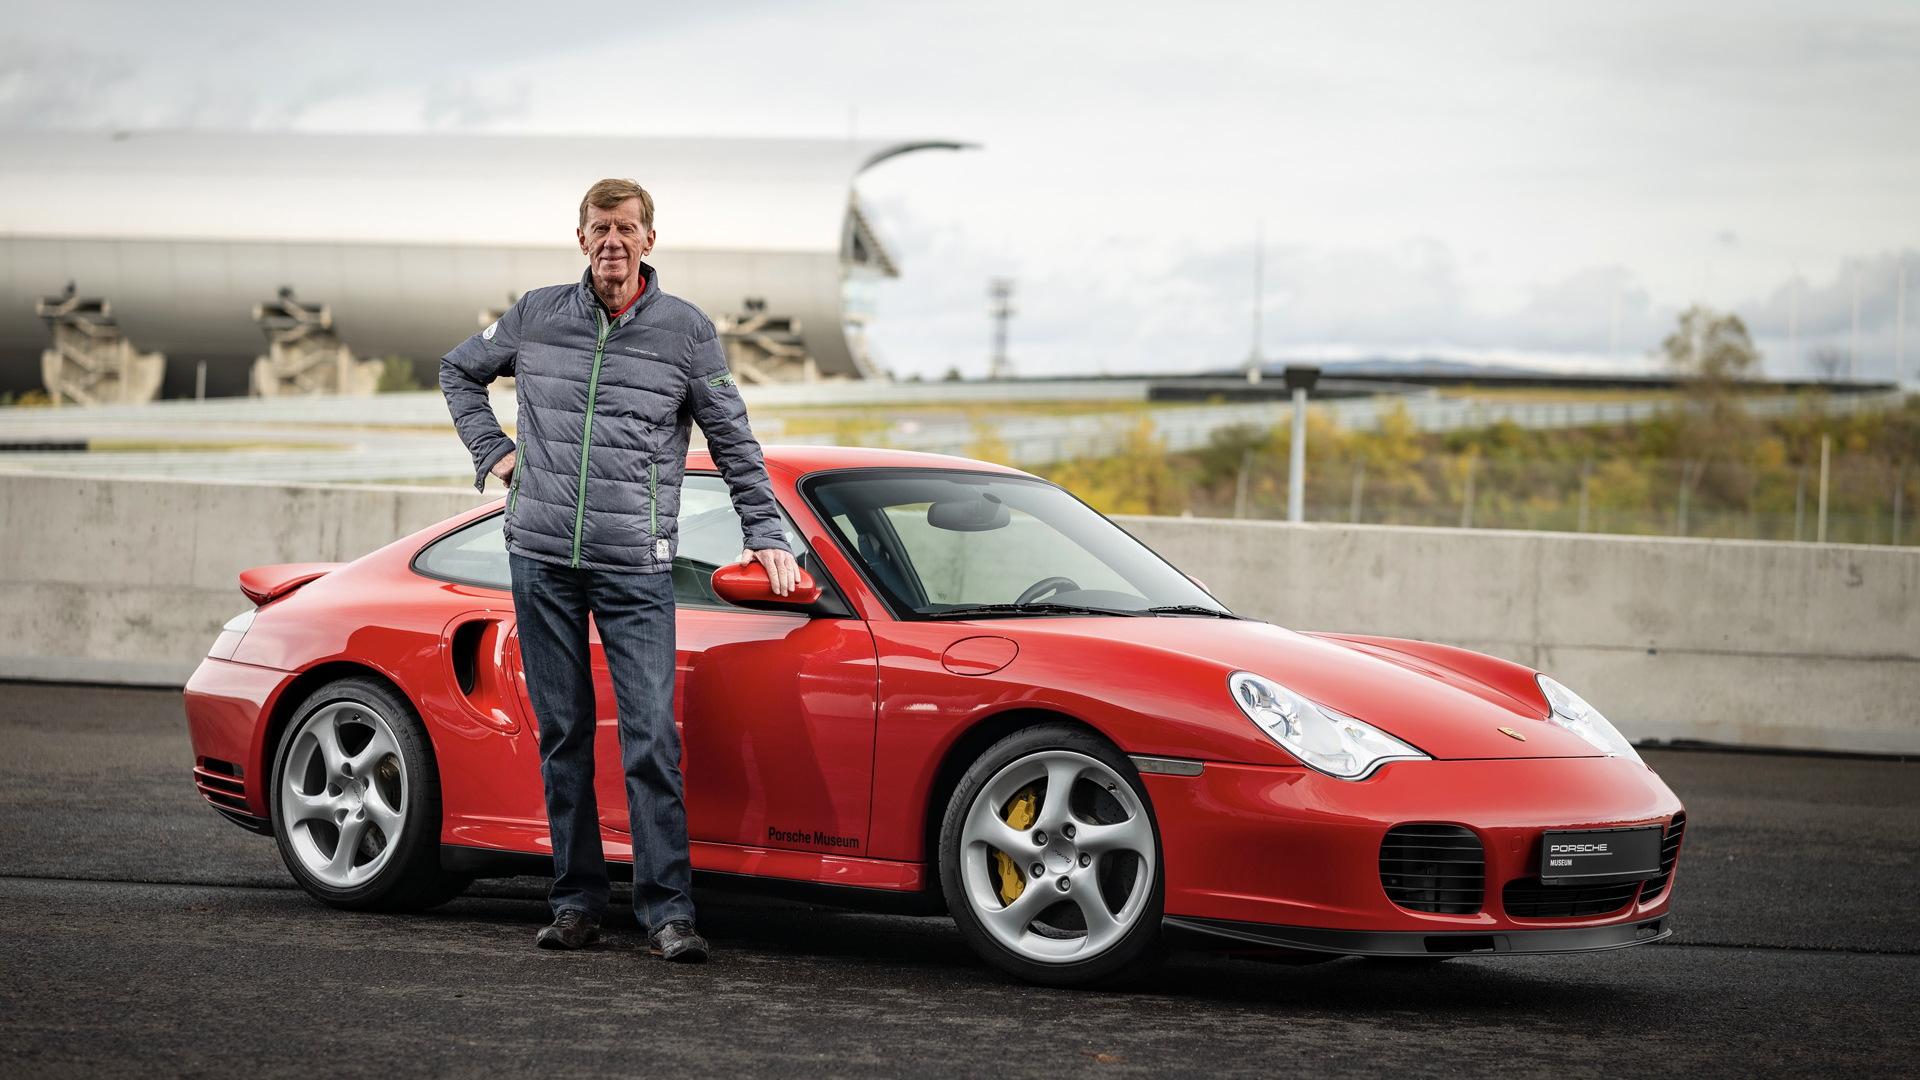 Walter Röhrl and the 996-generation Porsche 911 Turbo